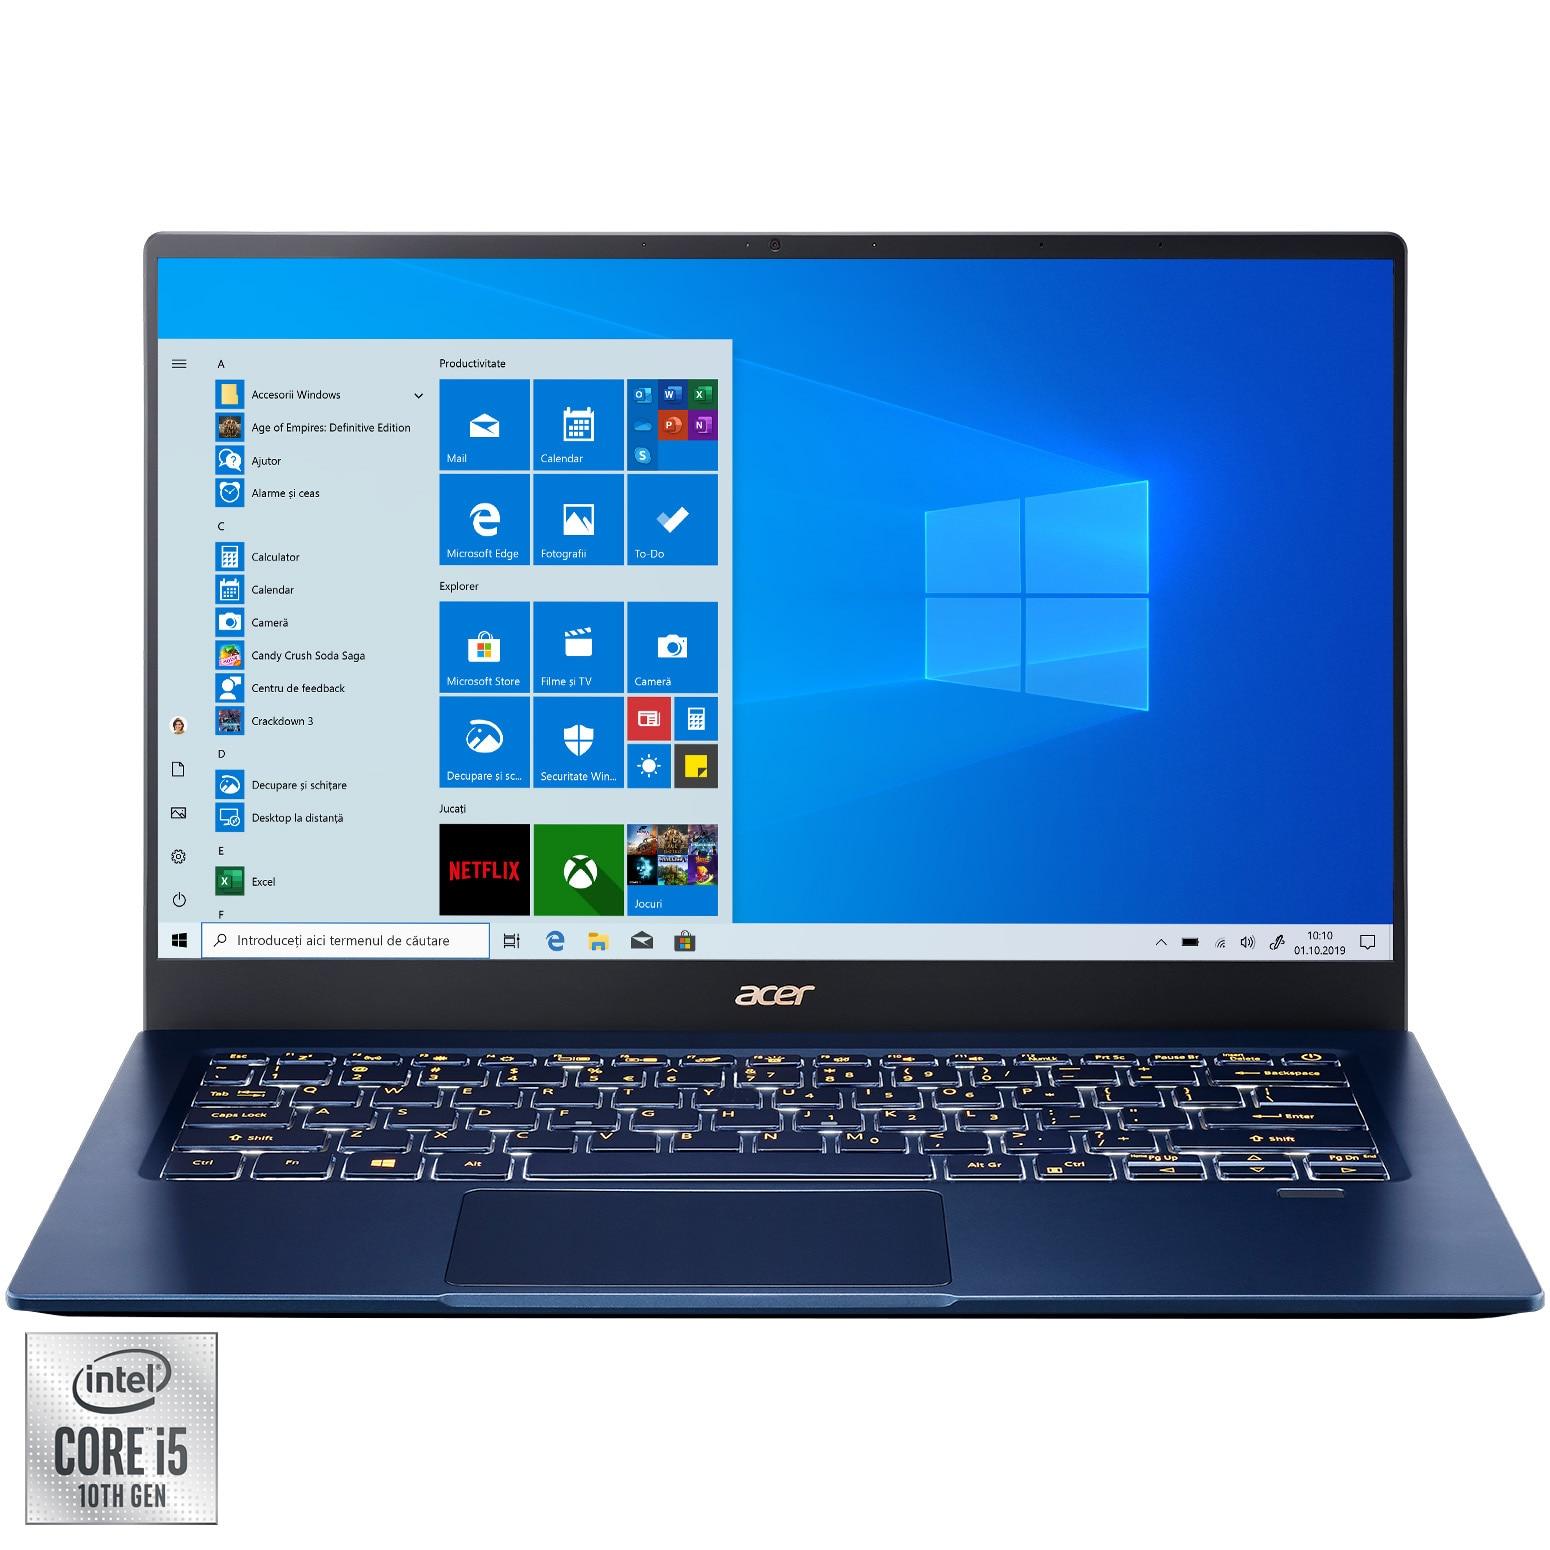 "Fotografie Laptop ultraportabil Acer Swift 5 SF514-54T cu procesor Intel Core i5-1035G1 pana la 3.60 GHz, 14"", Full HD, Touch, IPS, 8GB, 512GB SSD, Intel® UHD Graphics, Windows 10 Home, Blue"